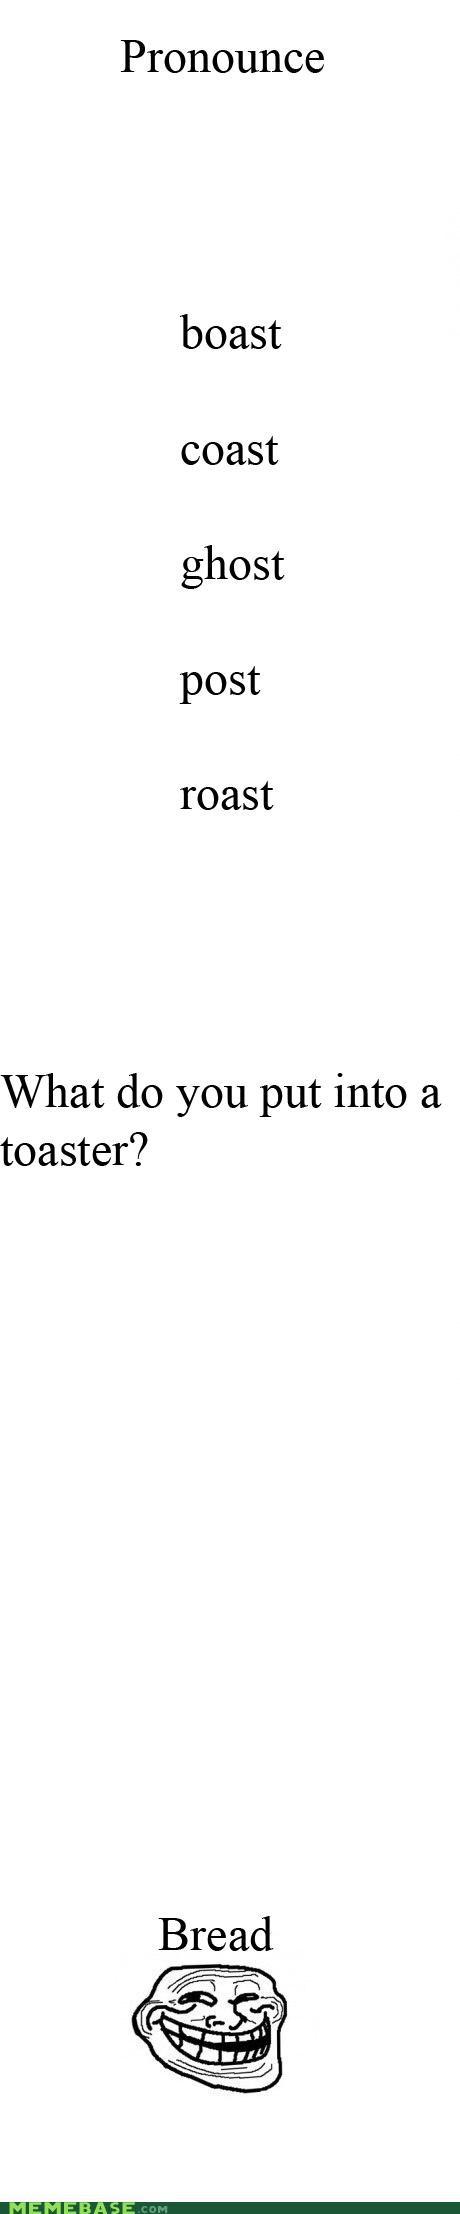 Pronunciation quiz toast - 4879252992